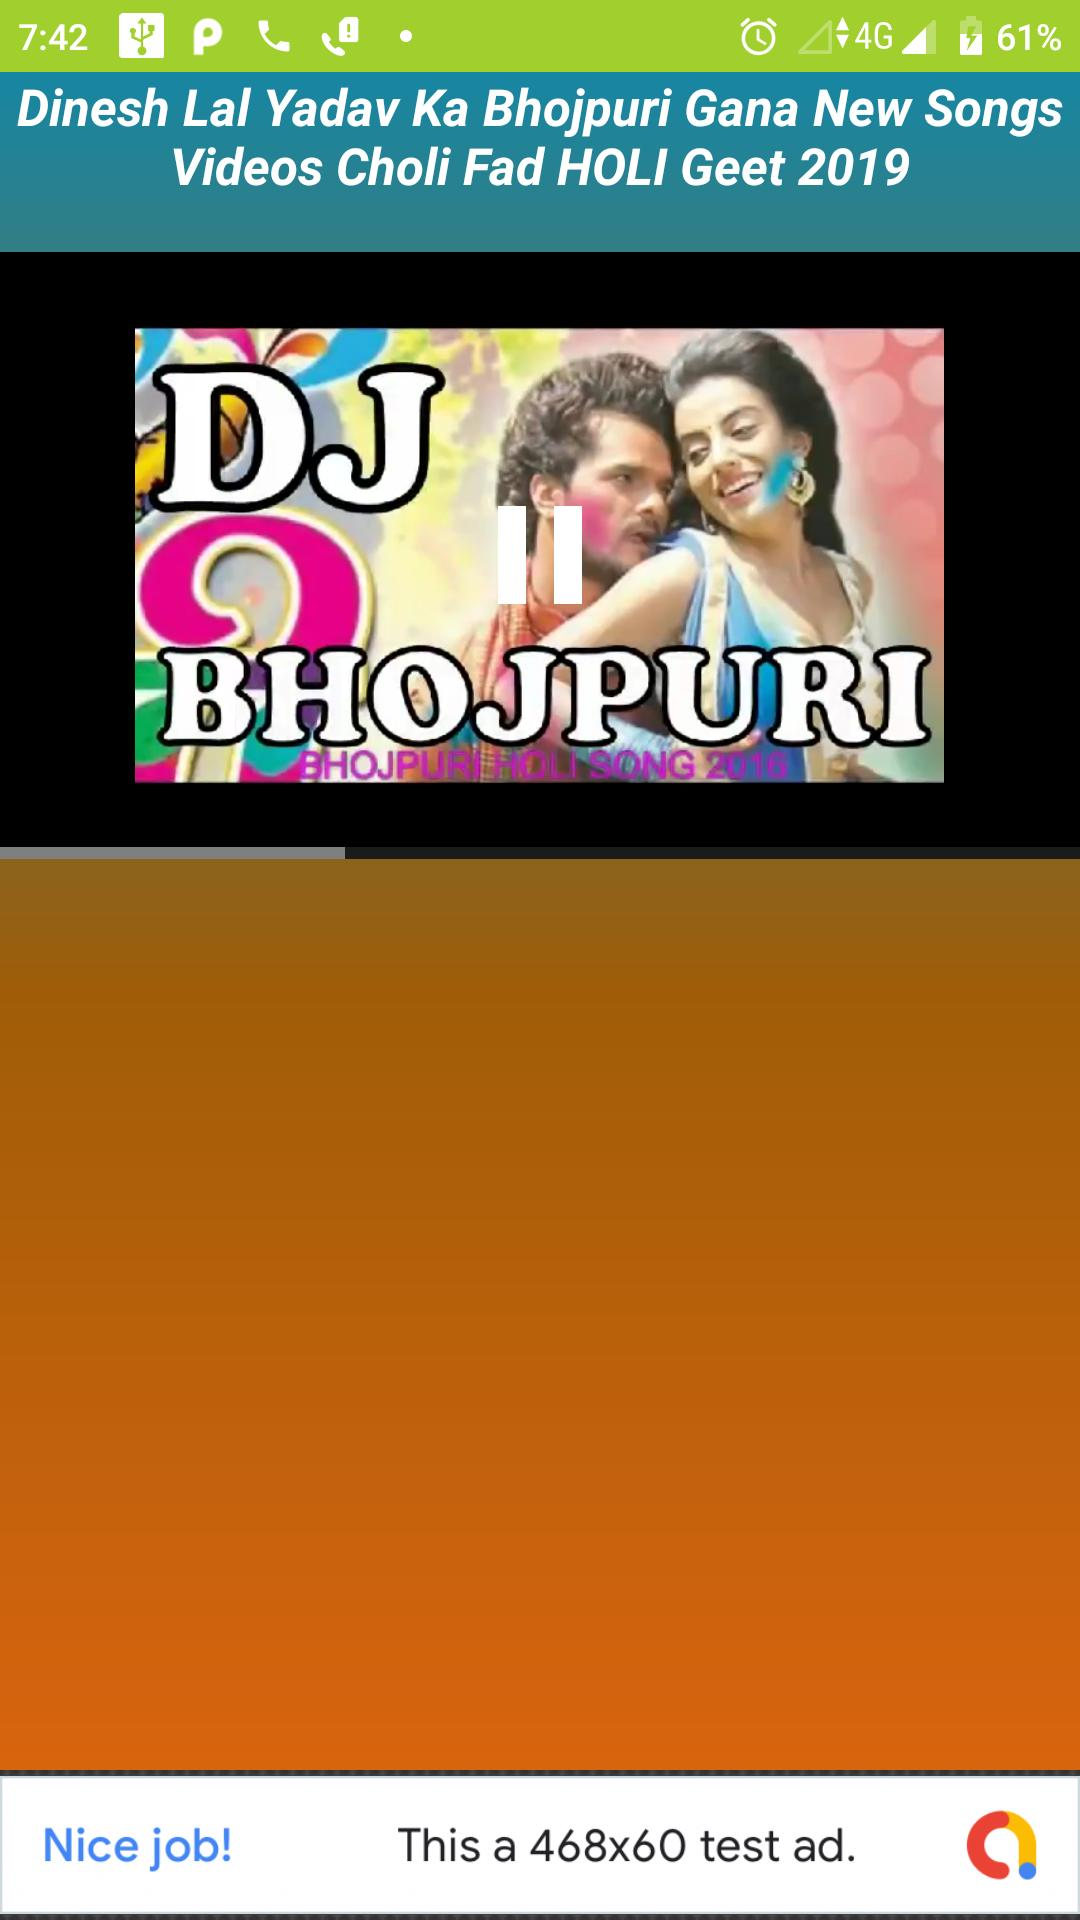 Dinesh Lal Yadav Ka Bhojpuri Gana New Songs Video For Android Apk Download